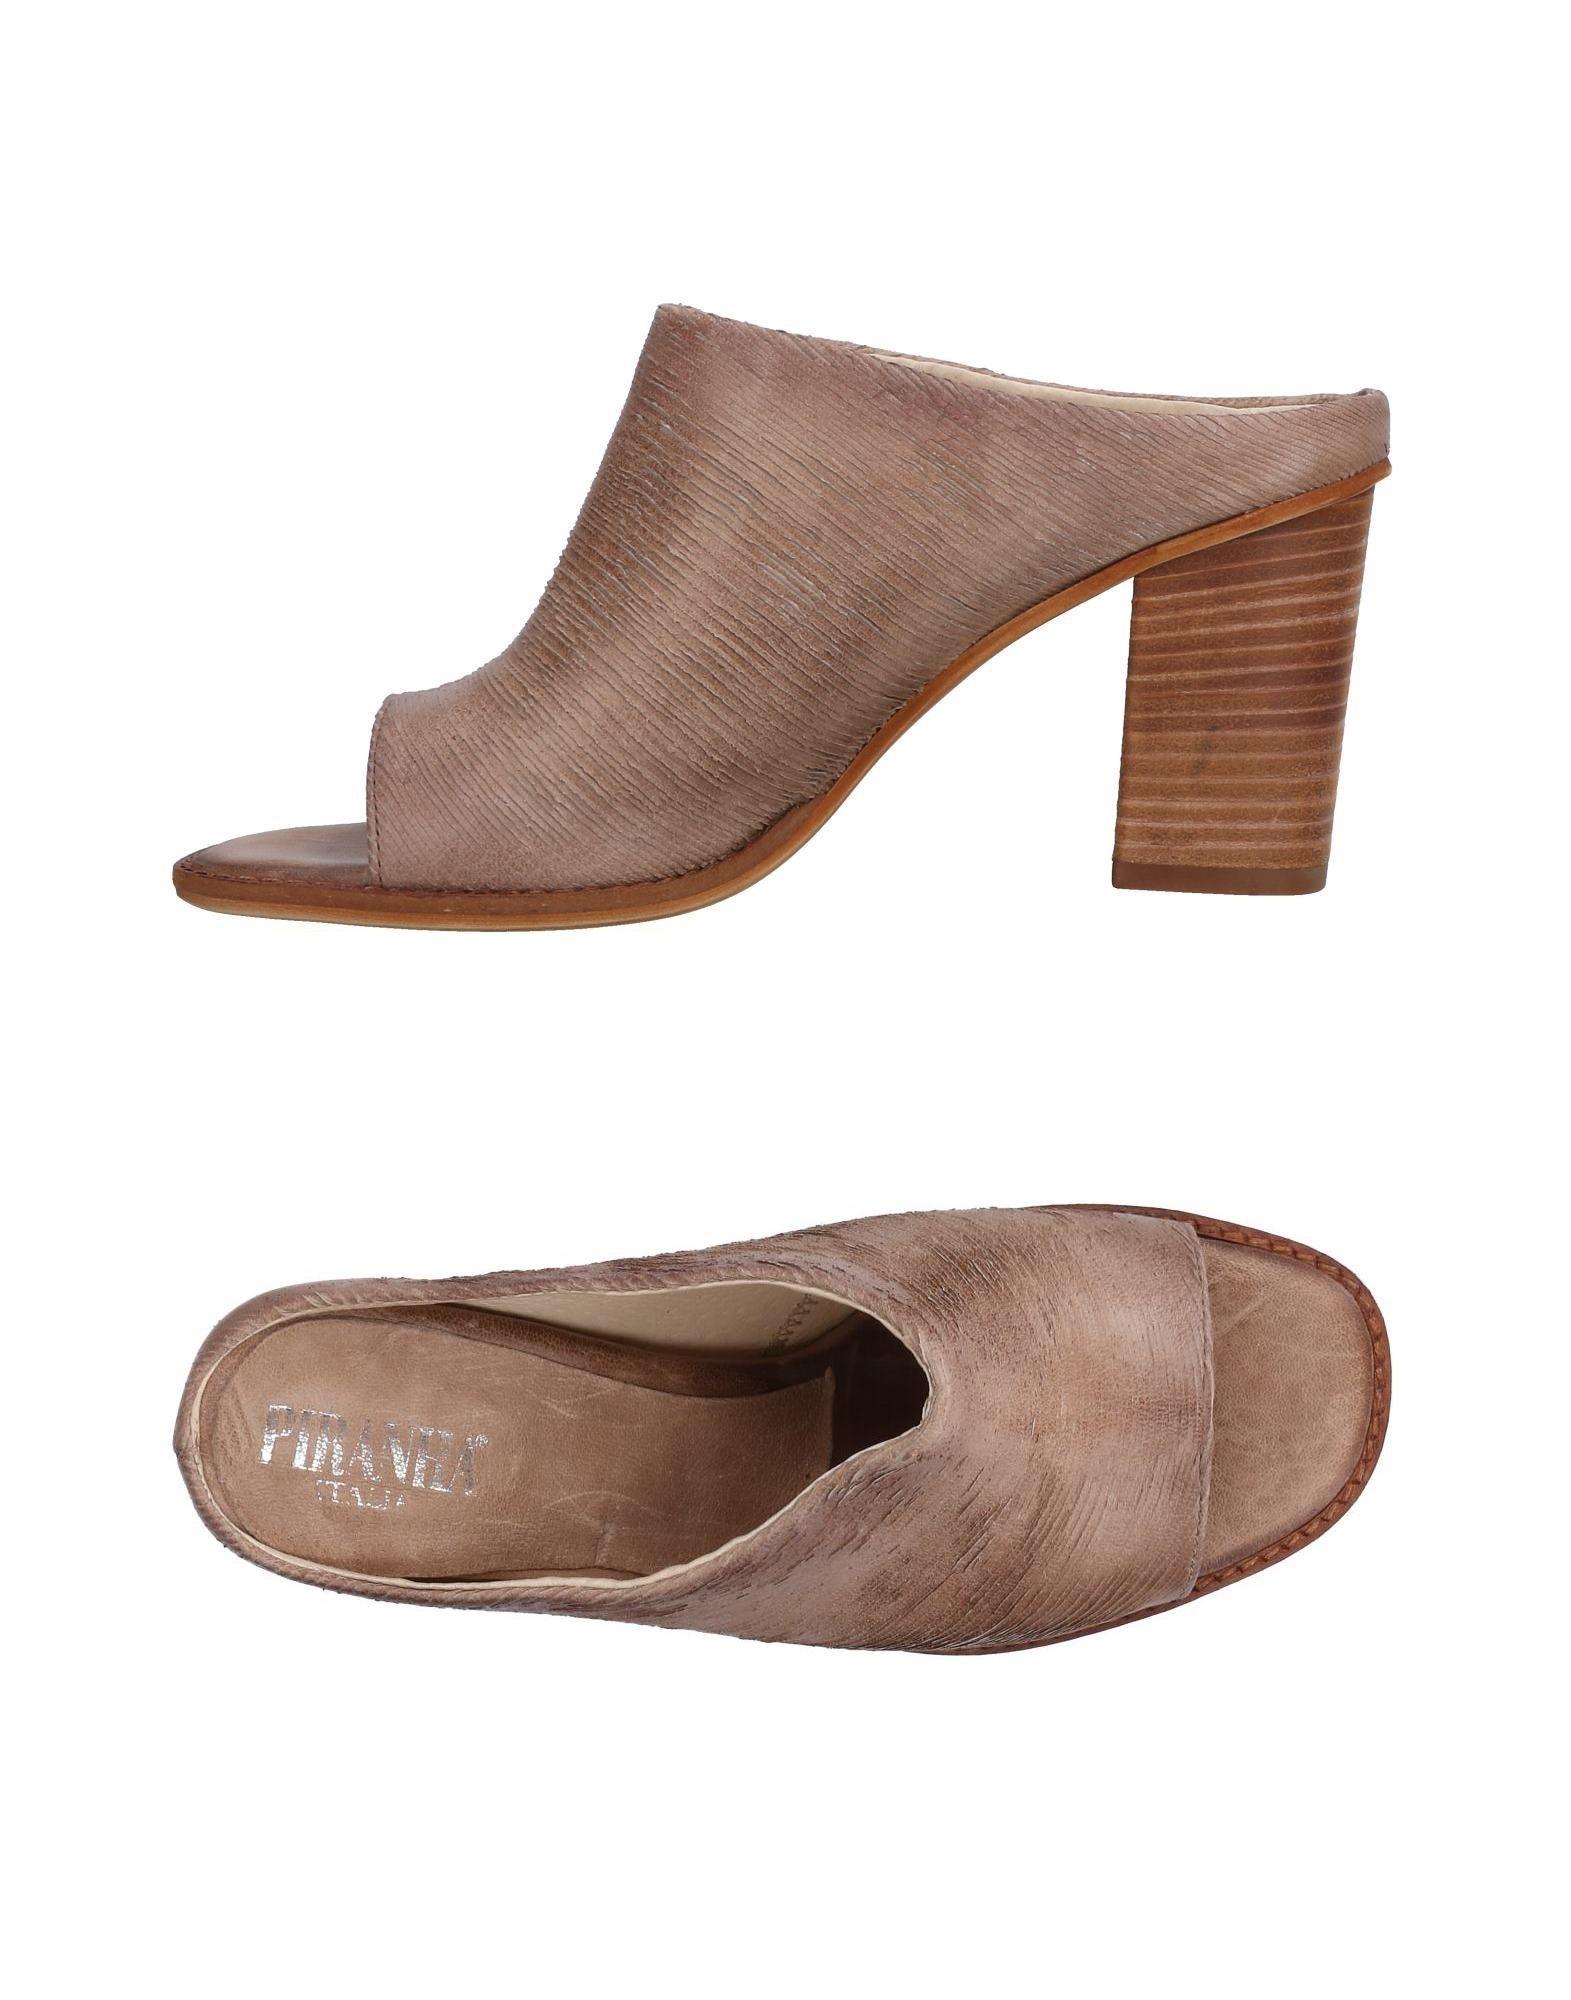 Piranha Pantoletten Damen  11518685WB Gute Qualität beliebte Schuhe